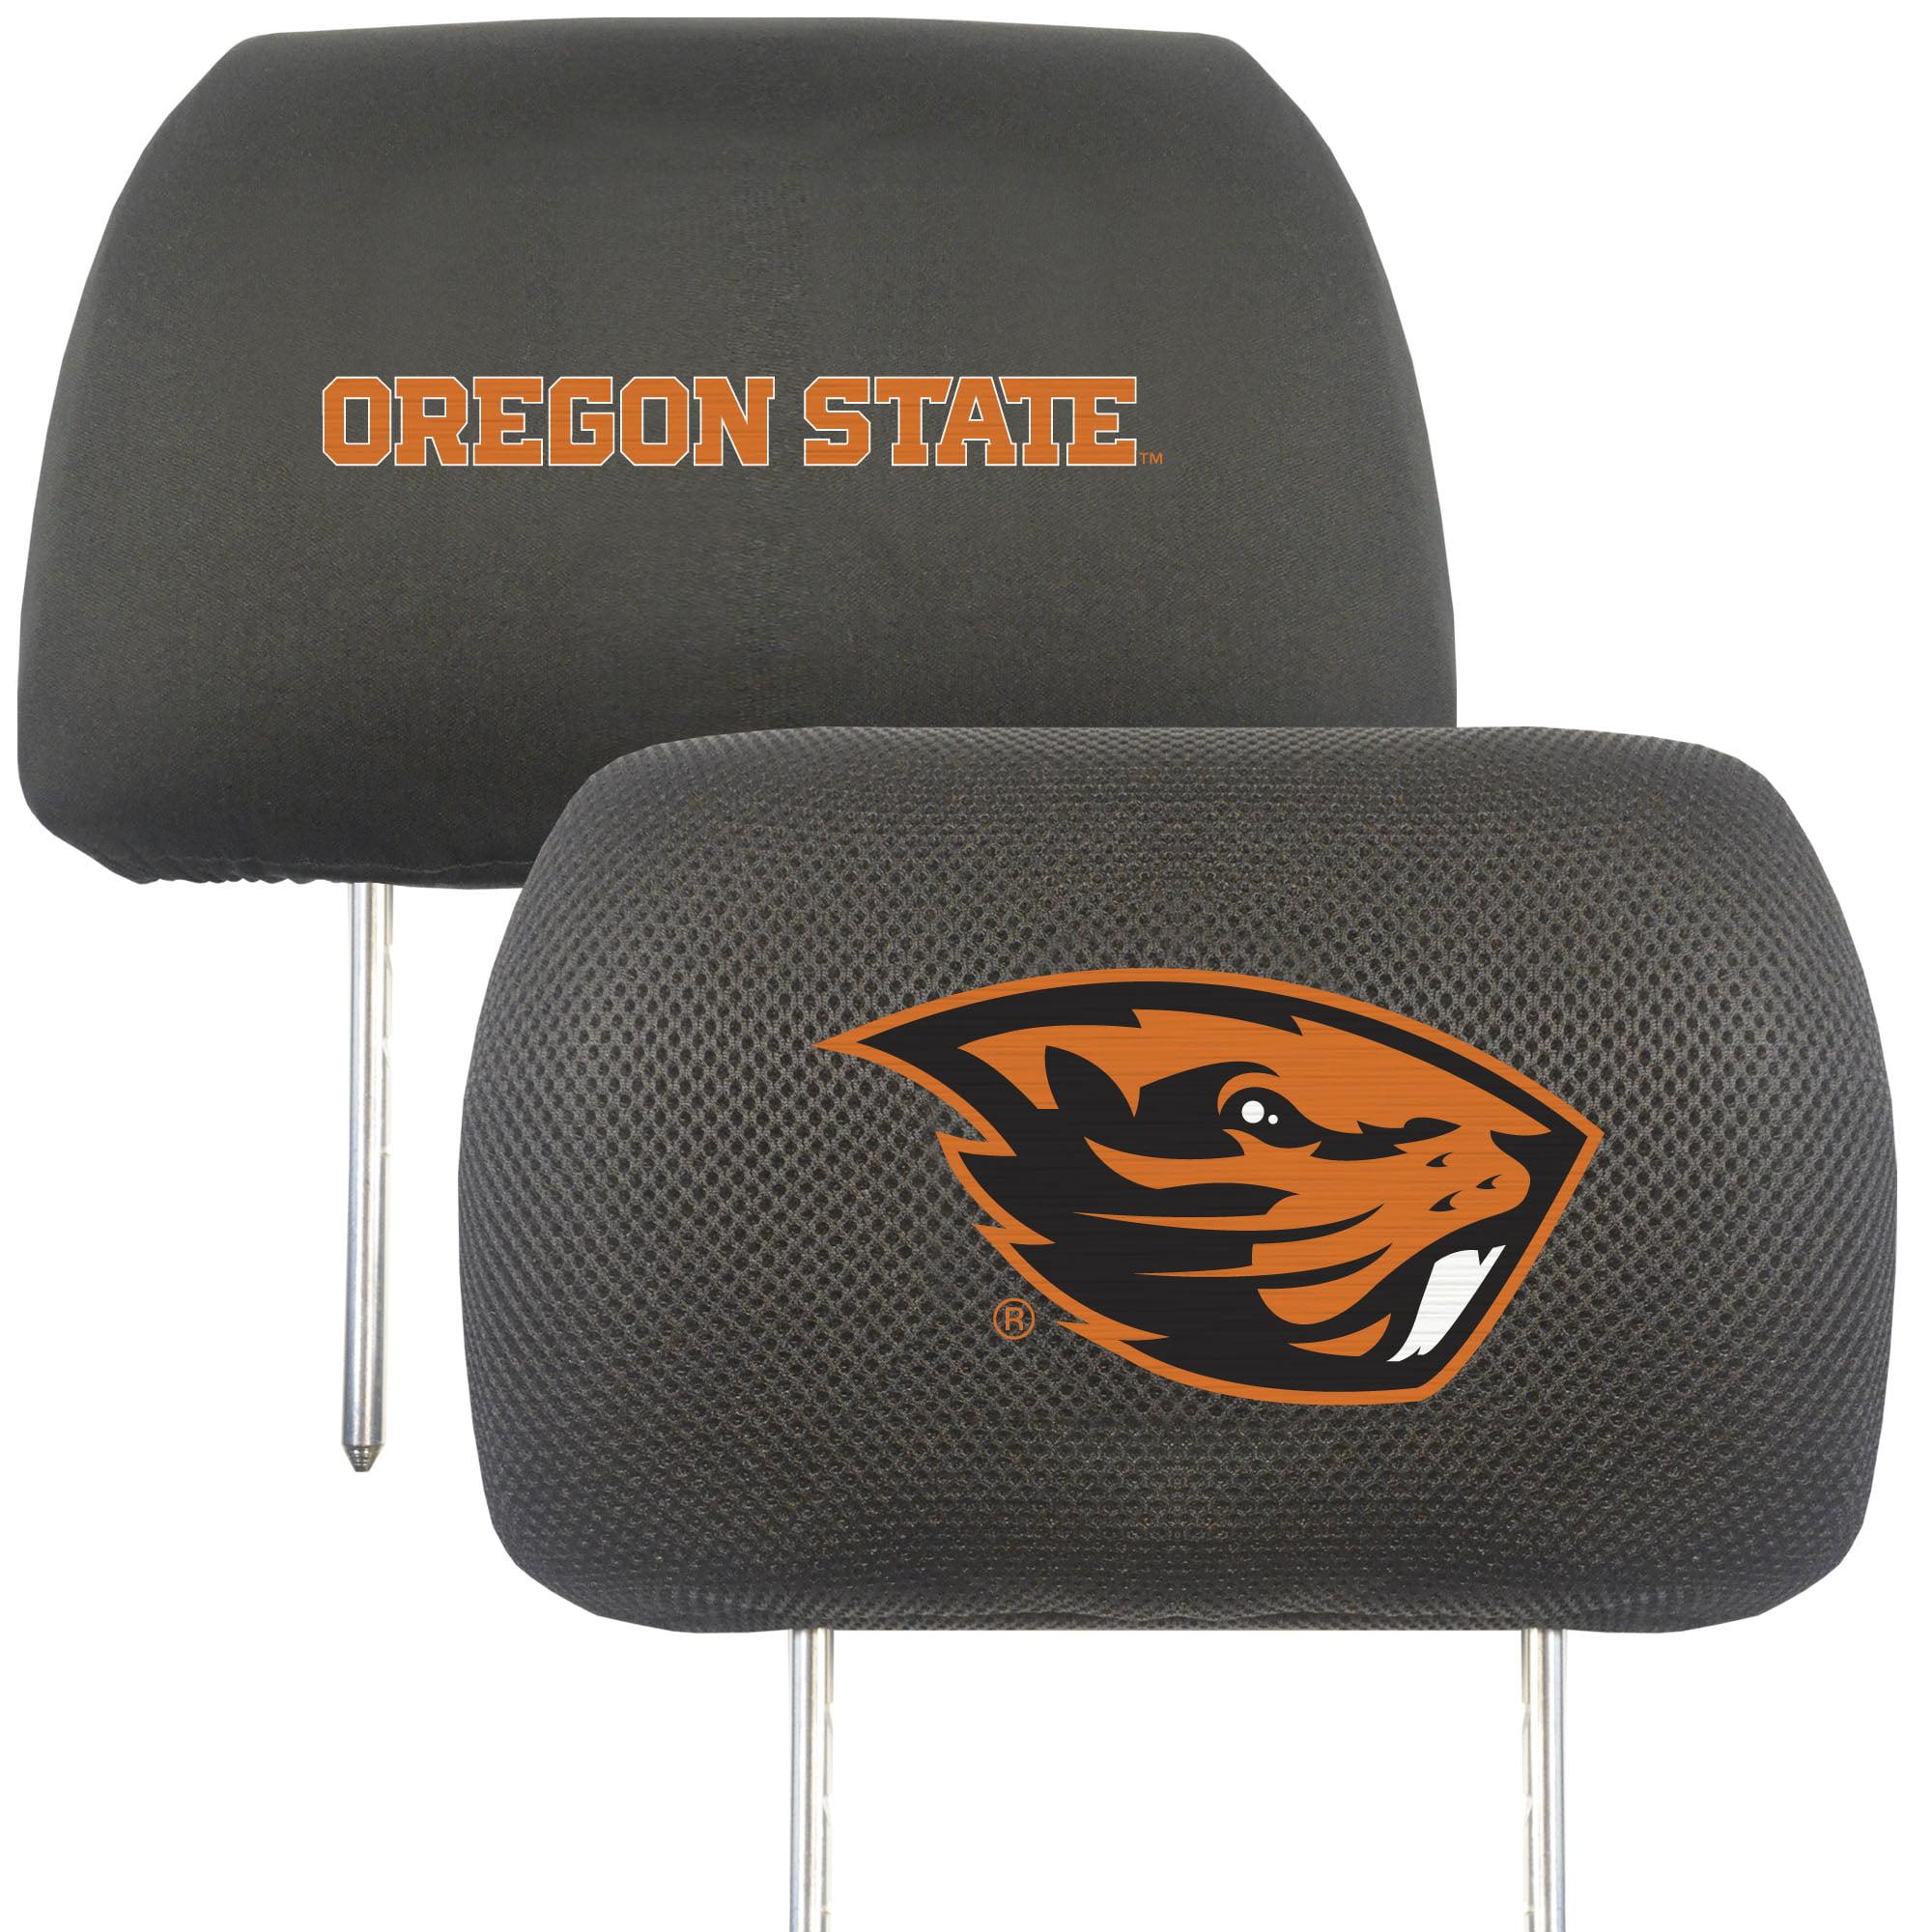 NCAA Oregon State University Beavers Head Rest Cover Automotive Accessory